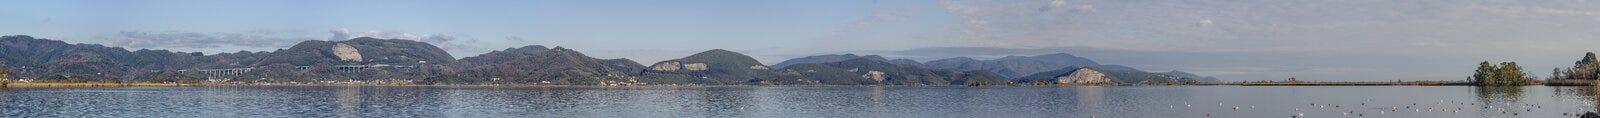 Massaciuccoli湖全景从Torre del Lago普奇尼,卢卡,托斯卡纳,意大利的 库存图片